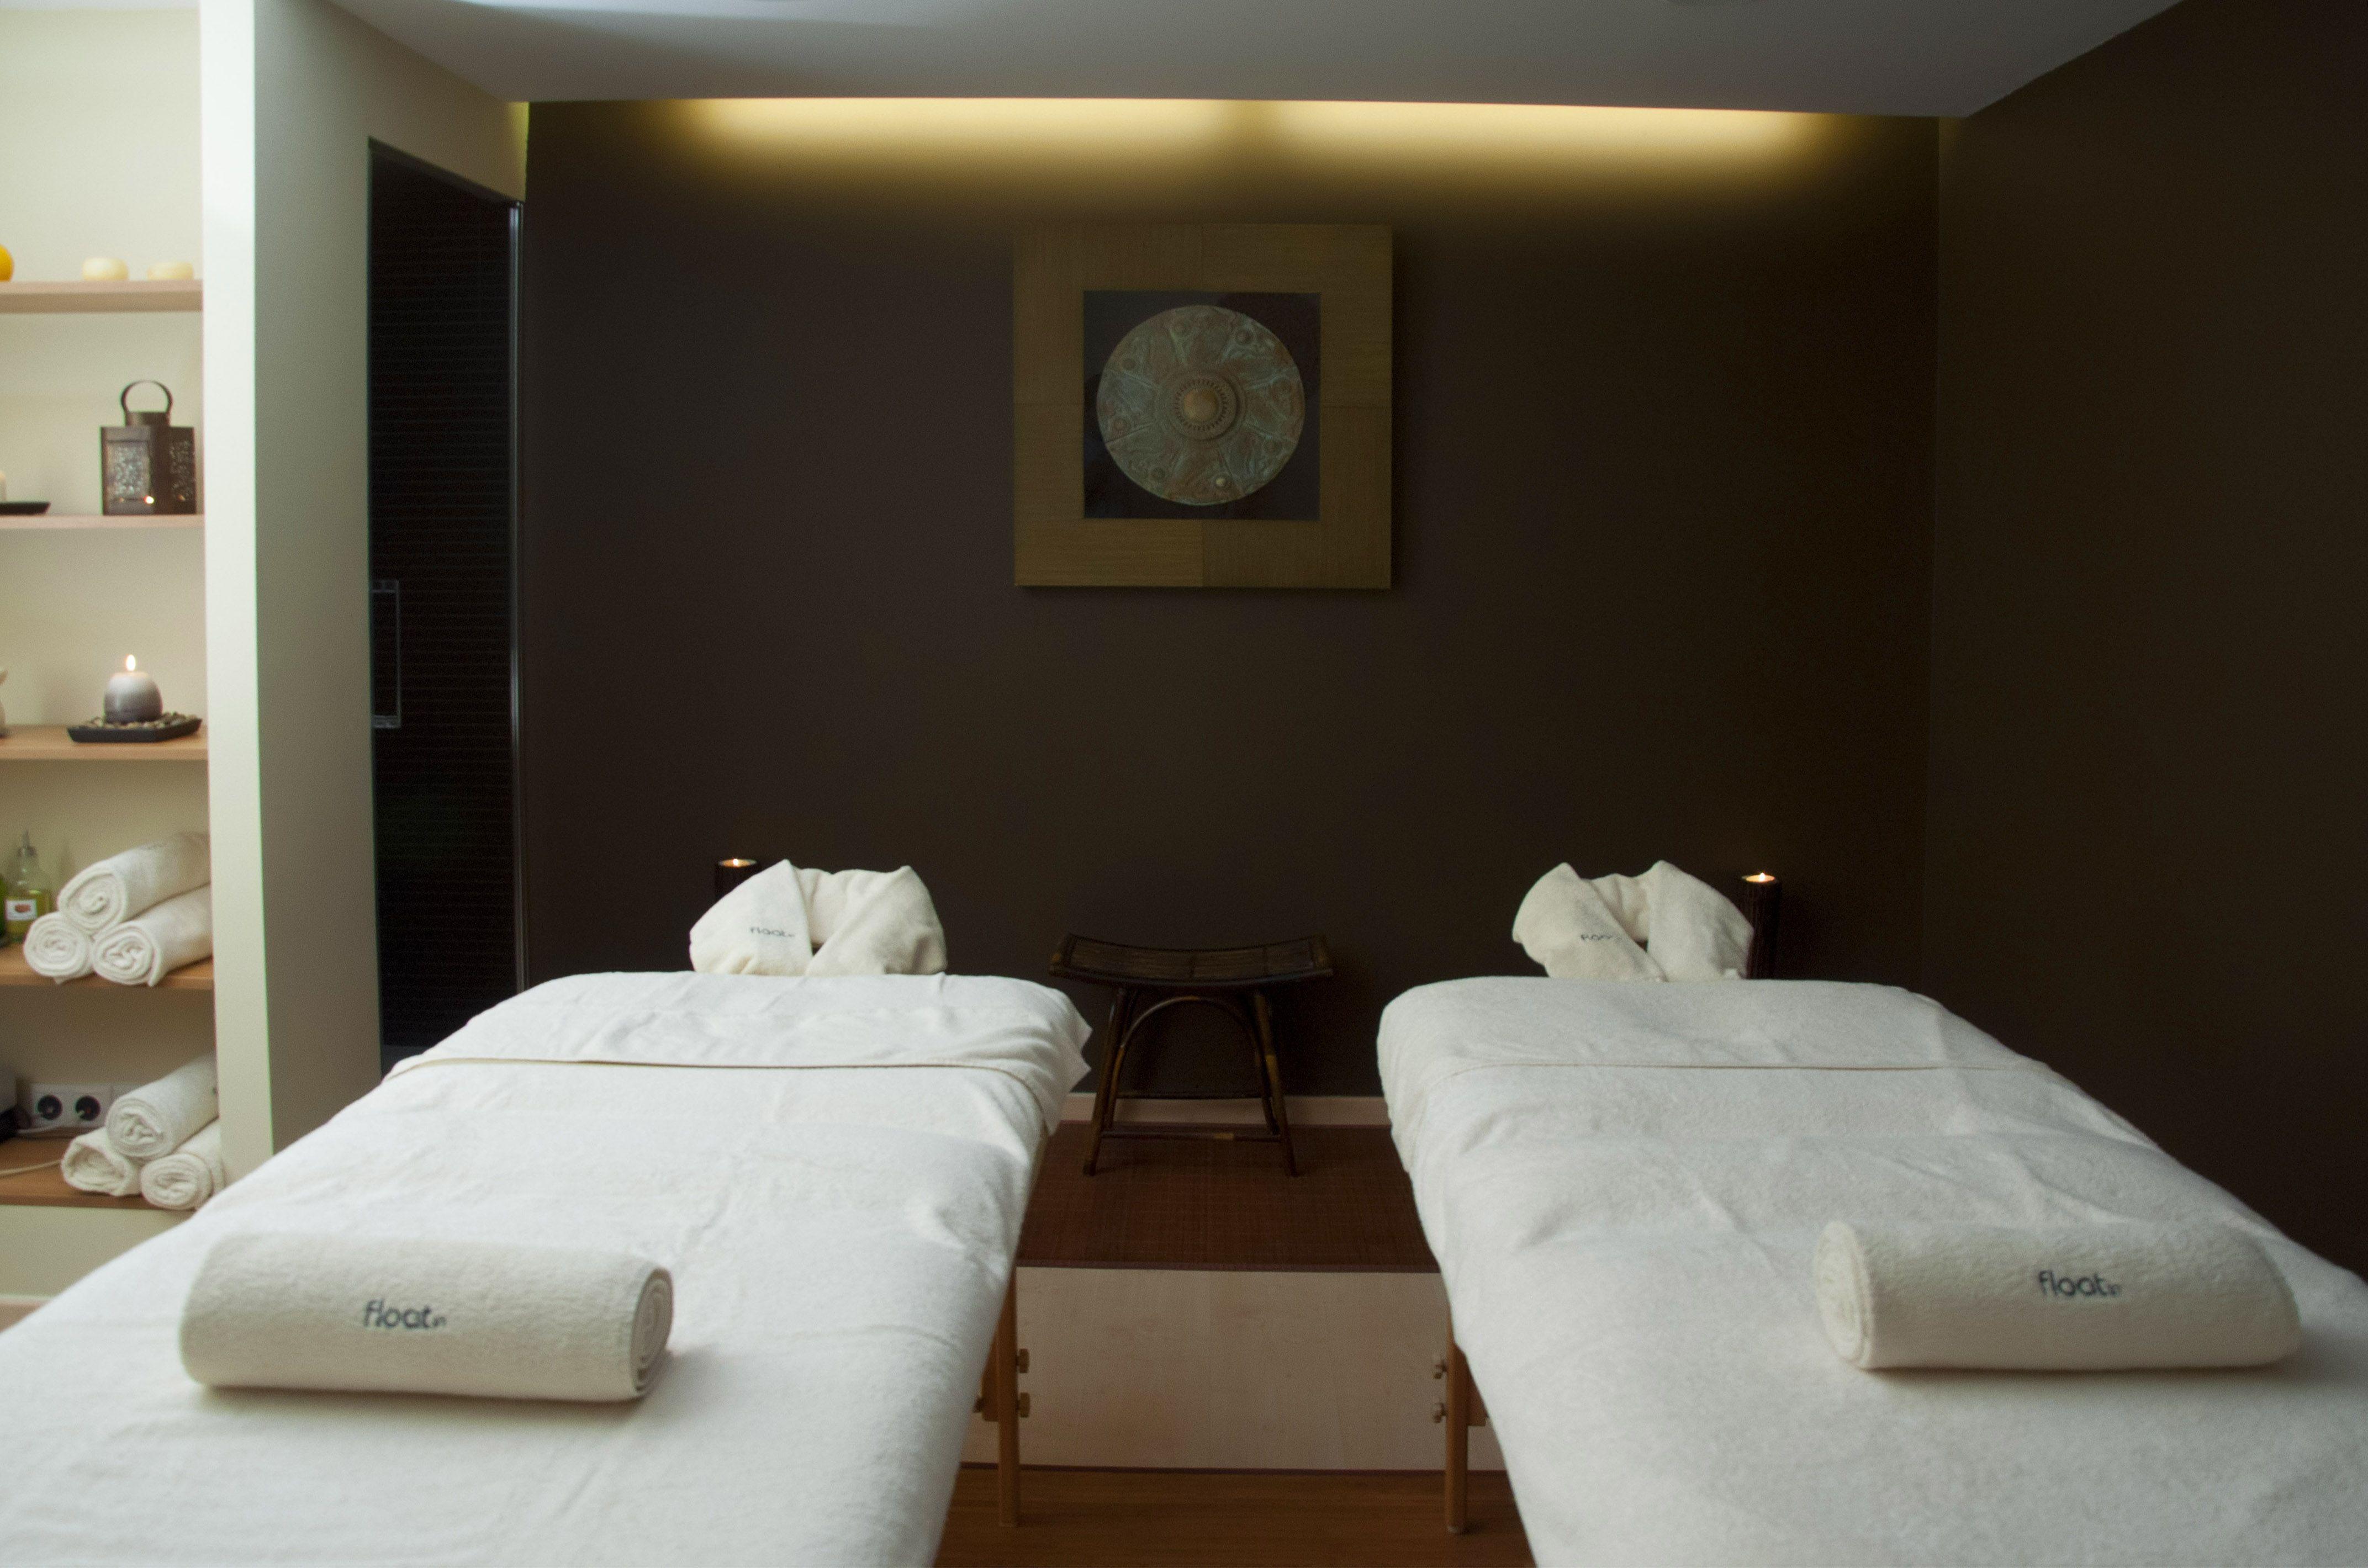 mandala room - sala para massagens de relaxamento a dois float in, Badezimmer dekoo